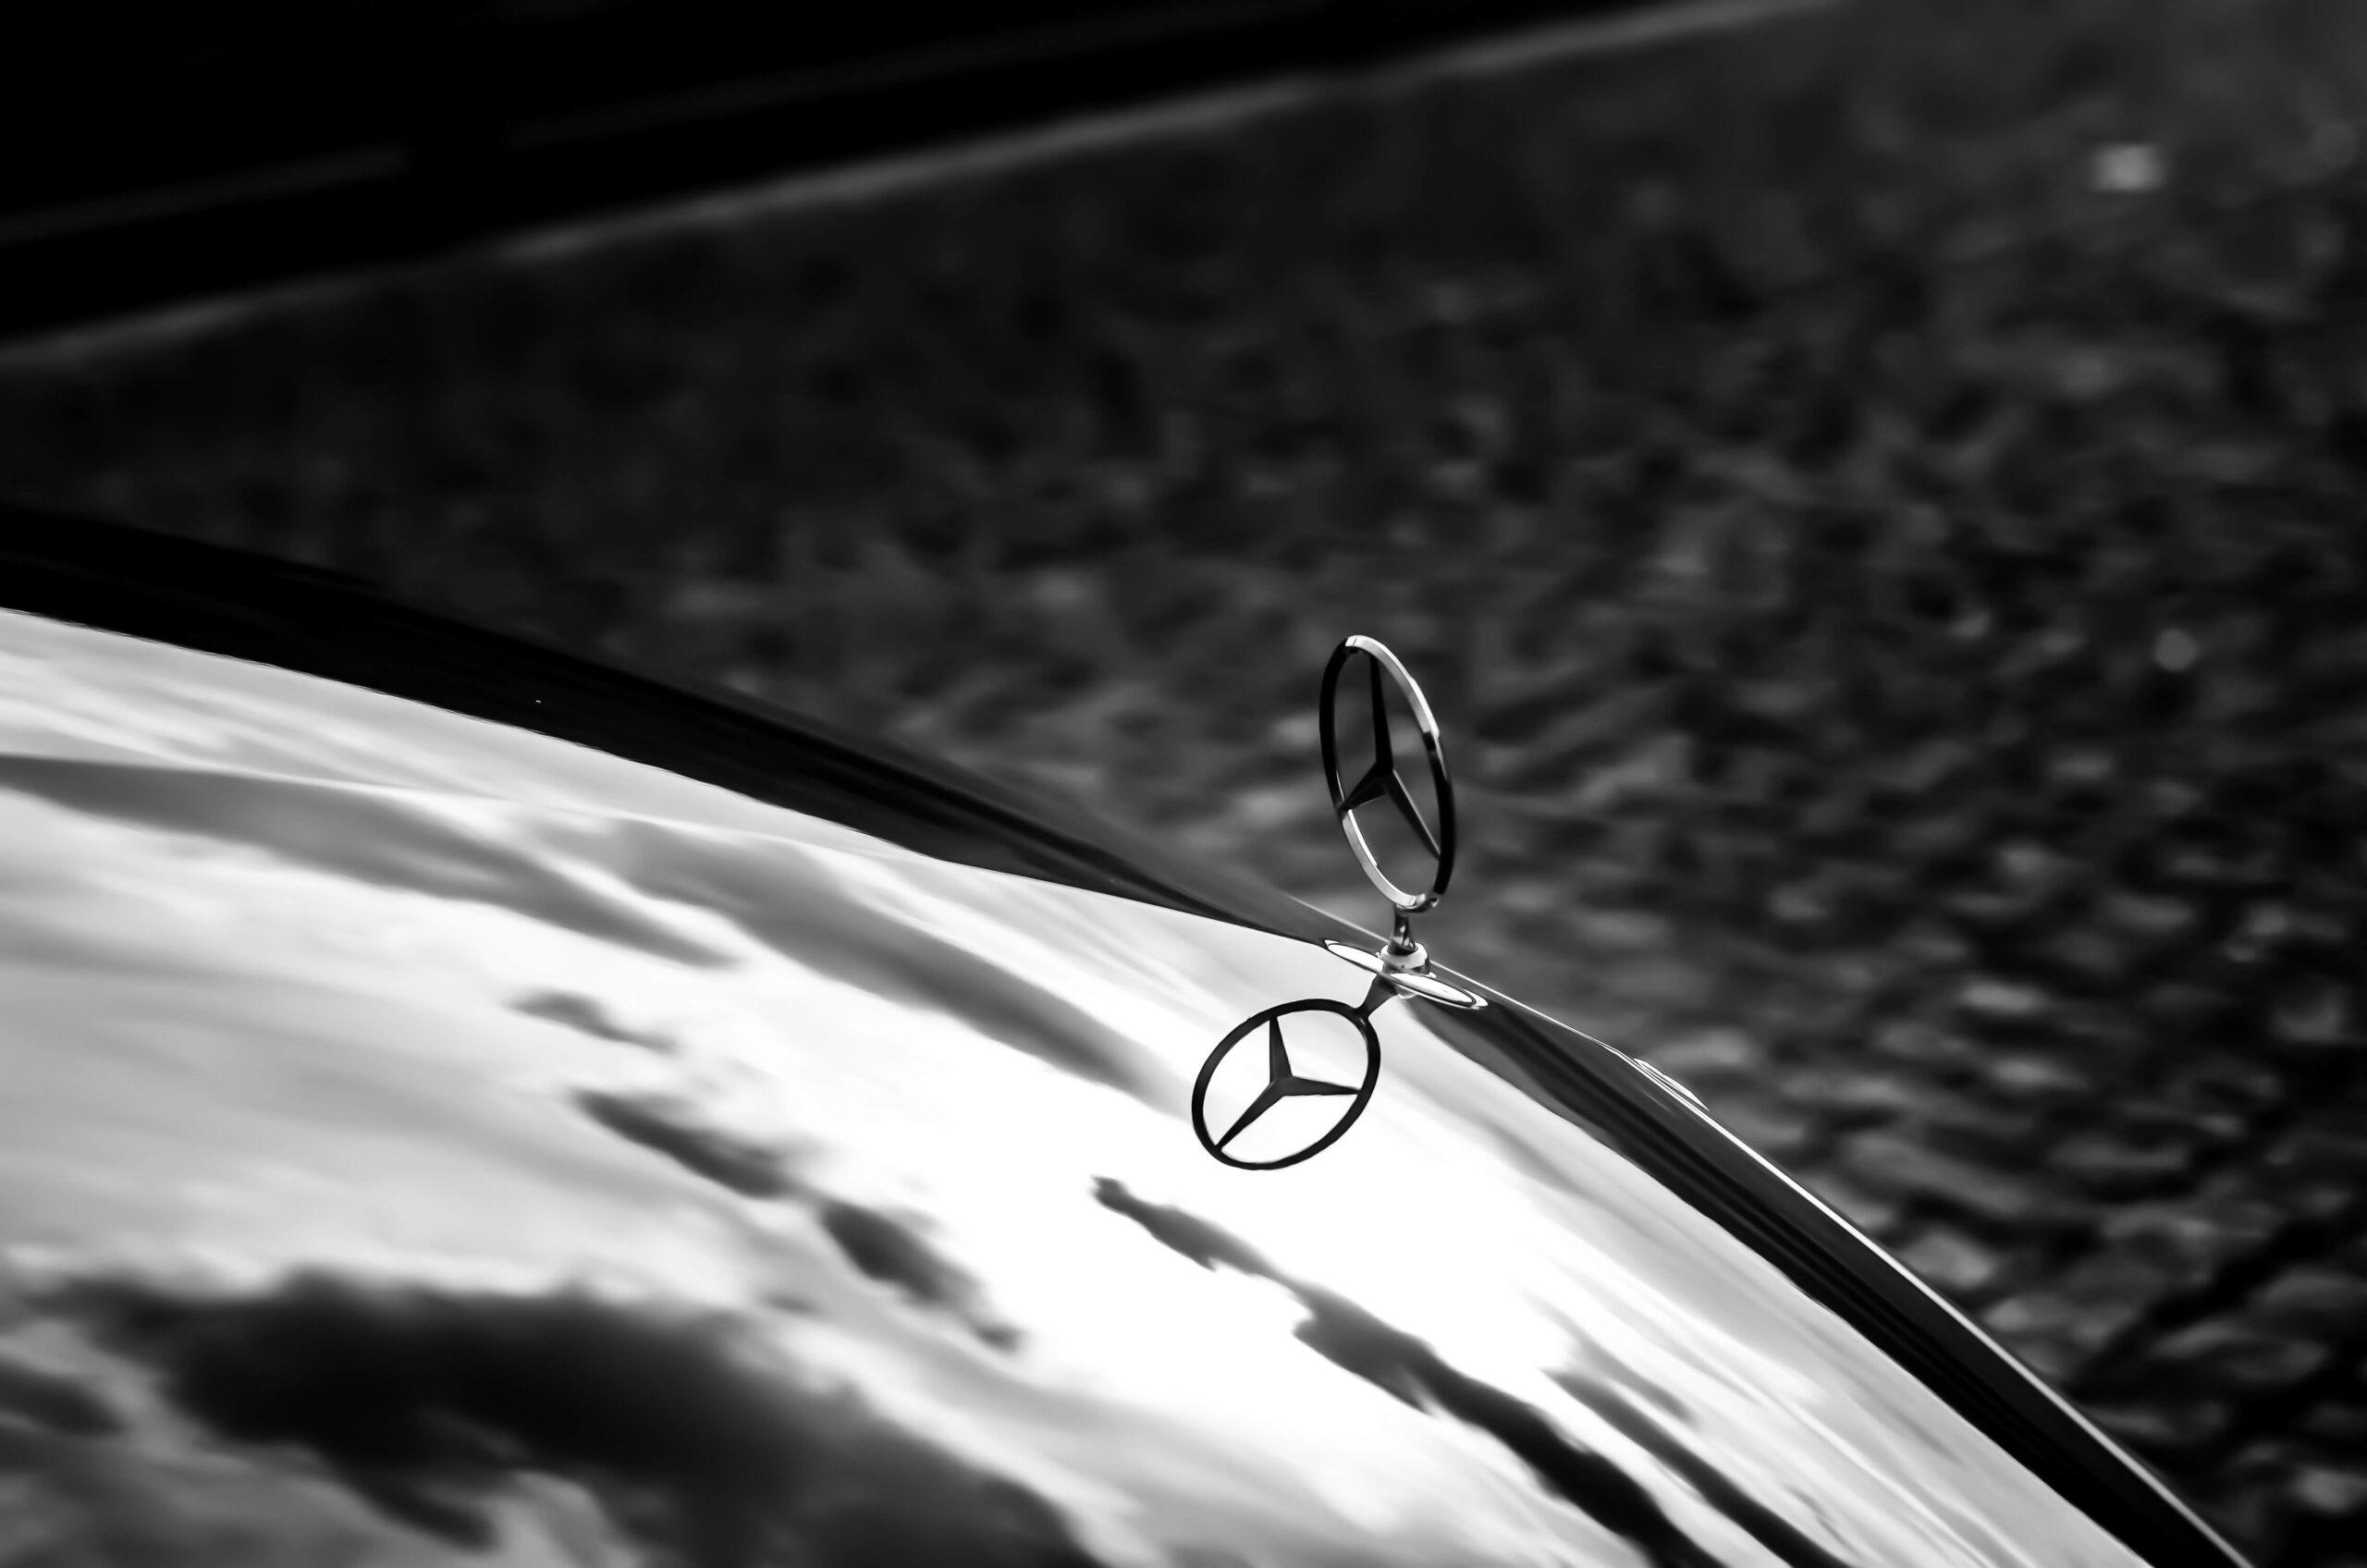 Mercedes Benz logo car detailing